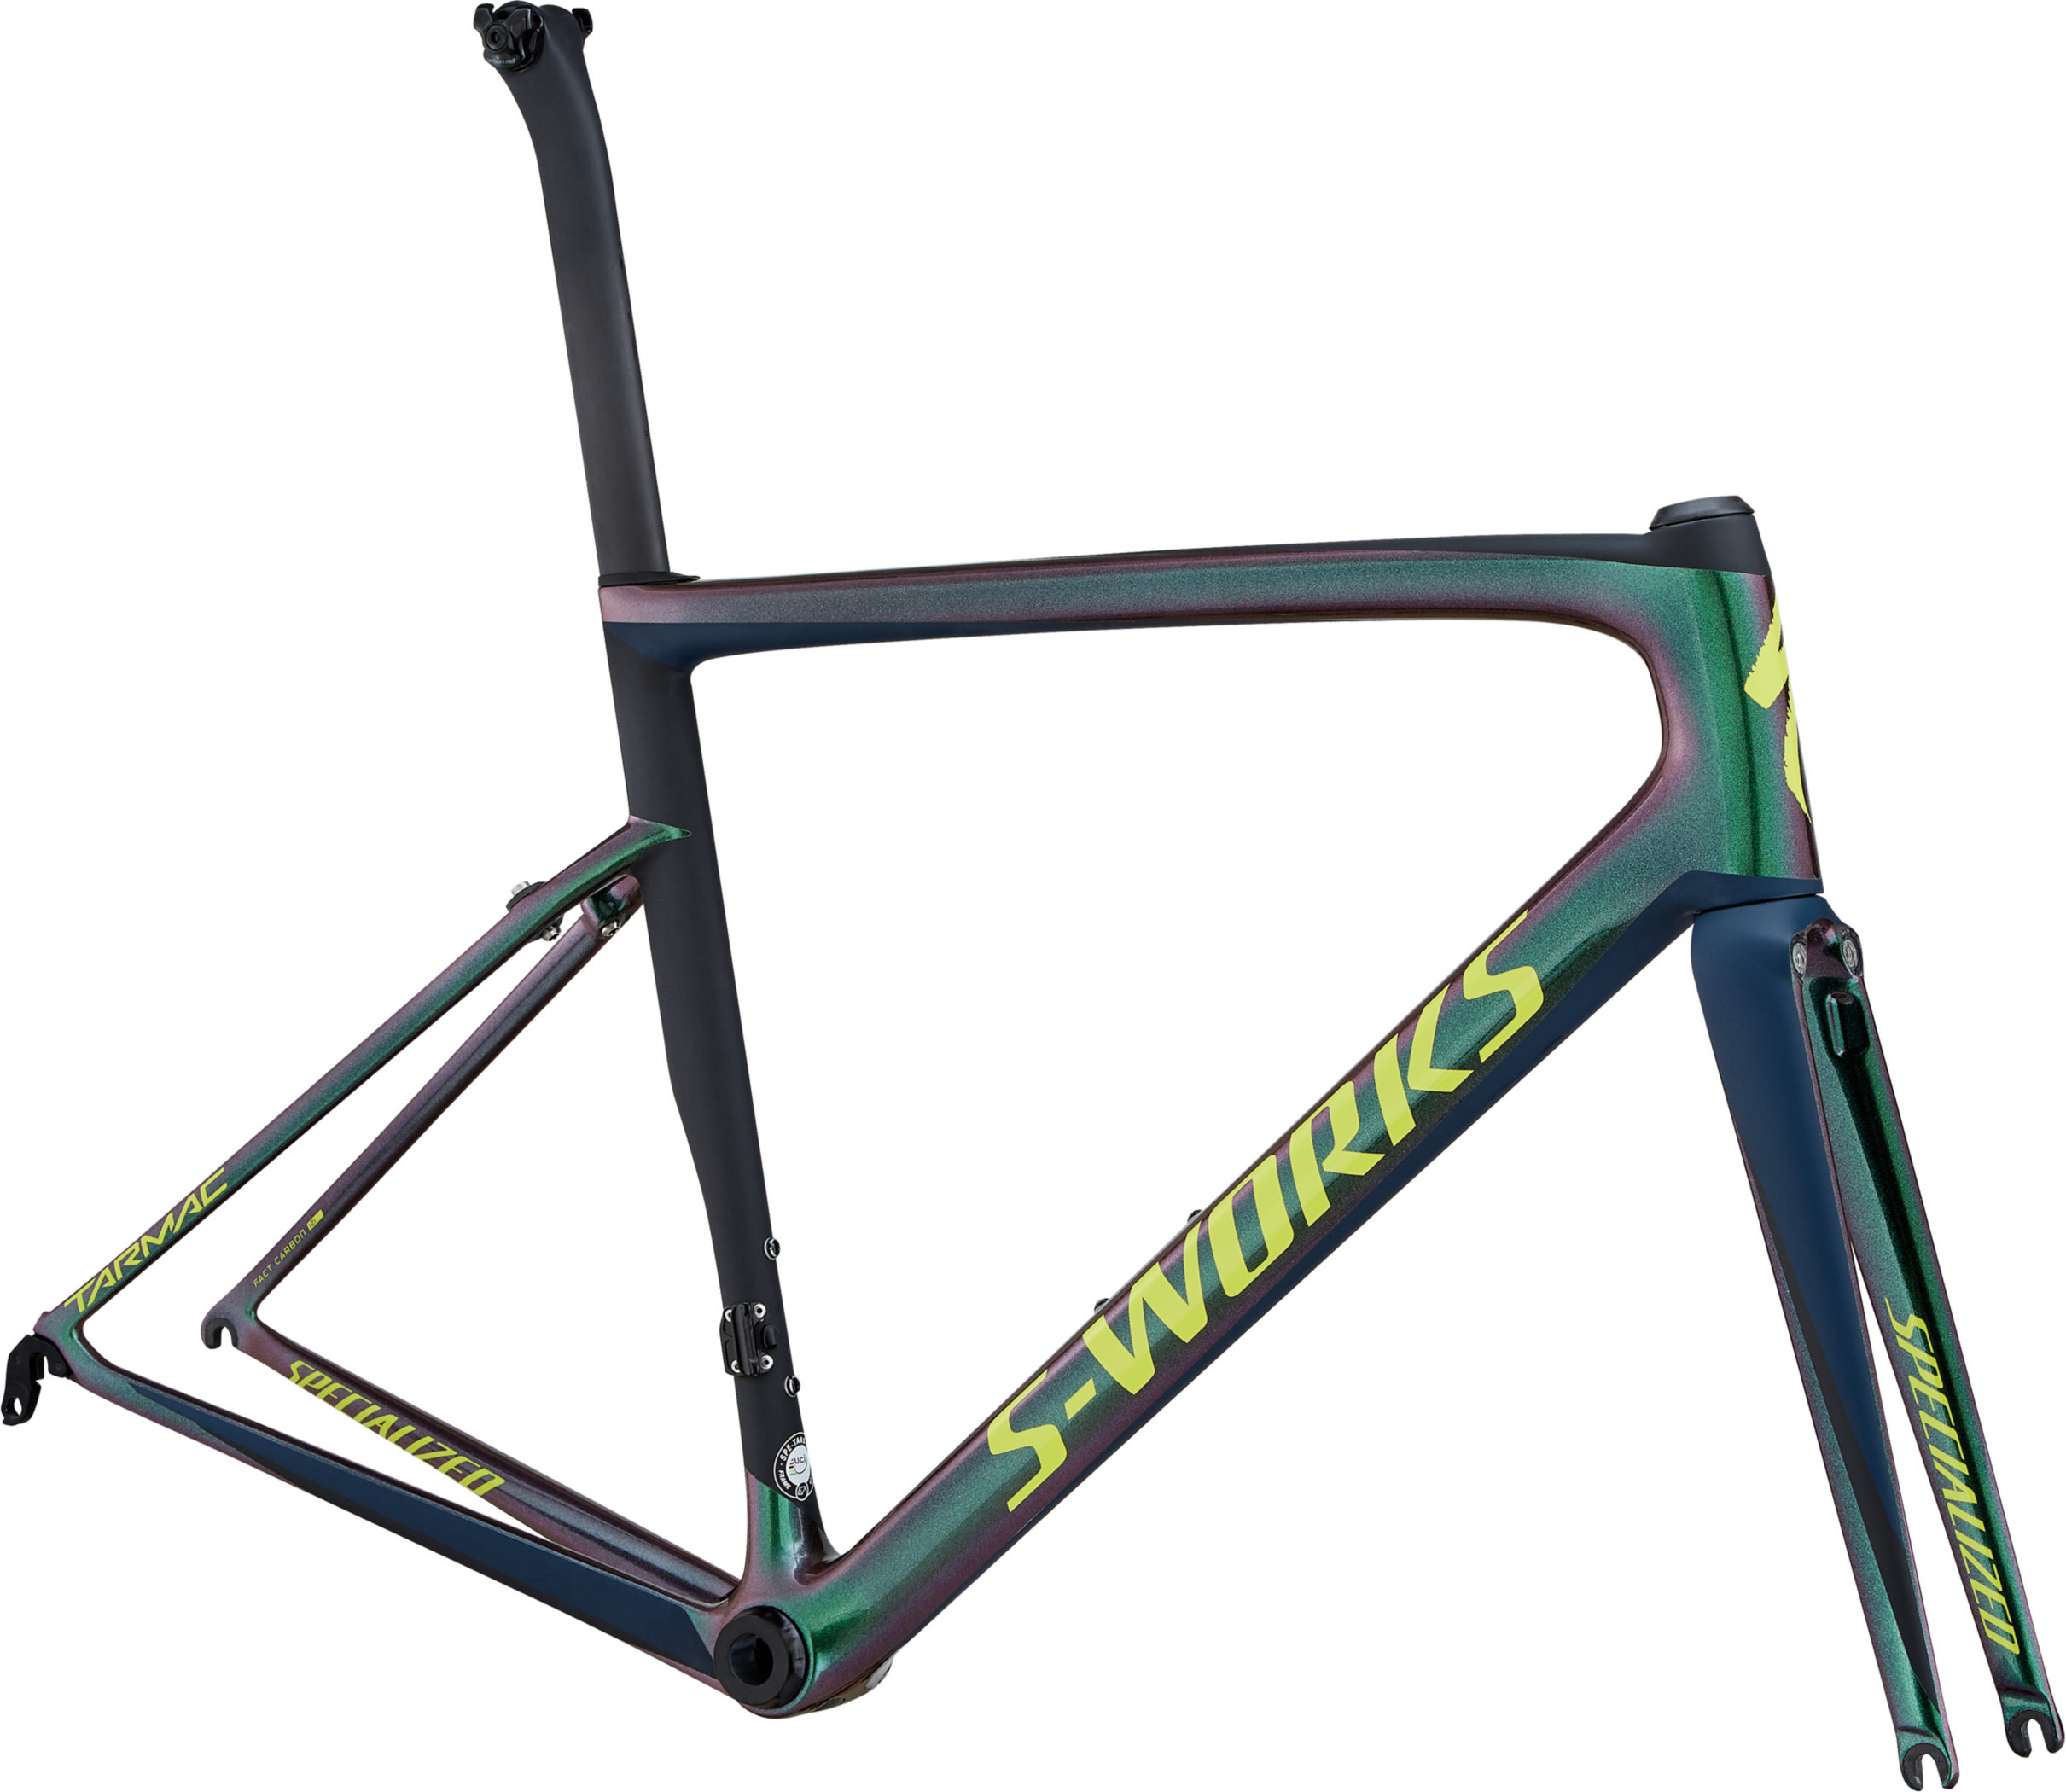 Specialized Men´s S-Works Tarmac Frameset Chameleon Green/Satin Cast Blue/Black/Team Yellow 49 - Pulsschlag Bike+Sport